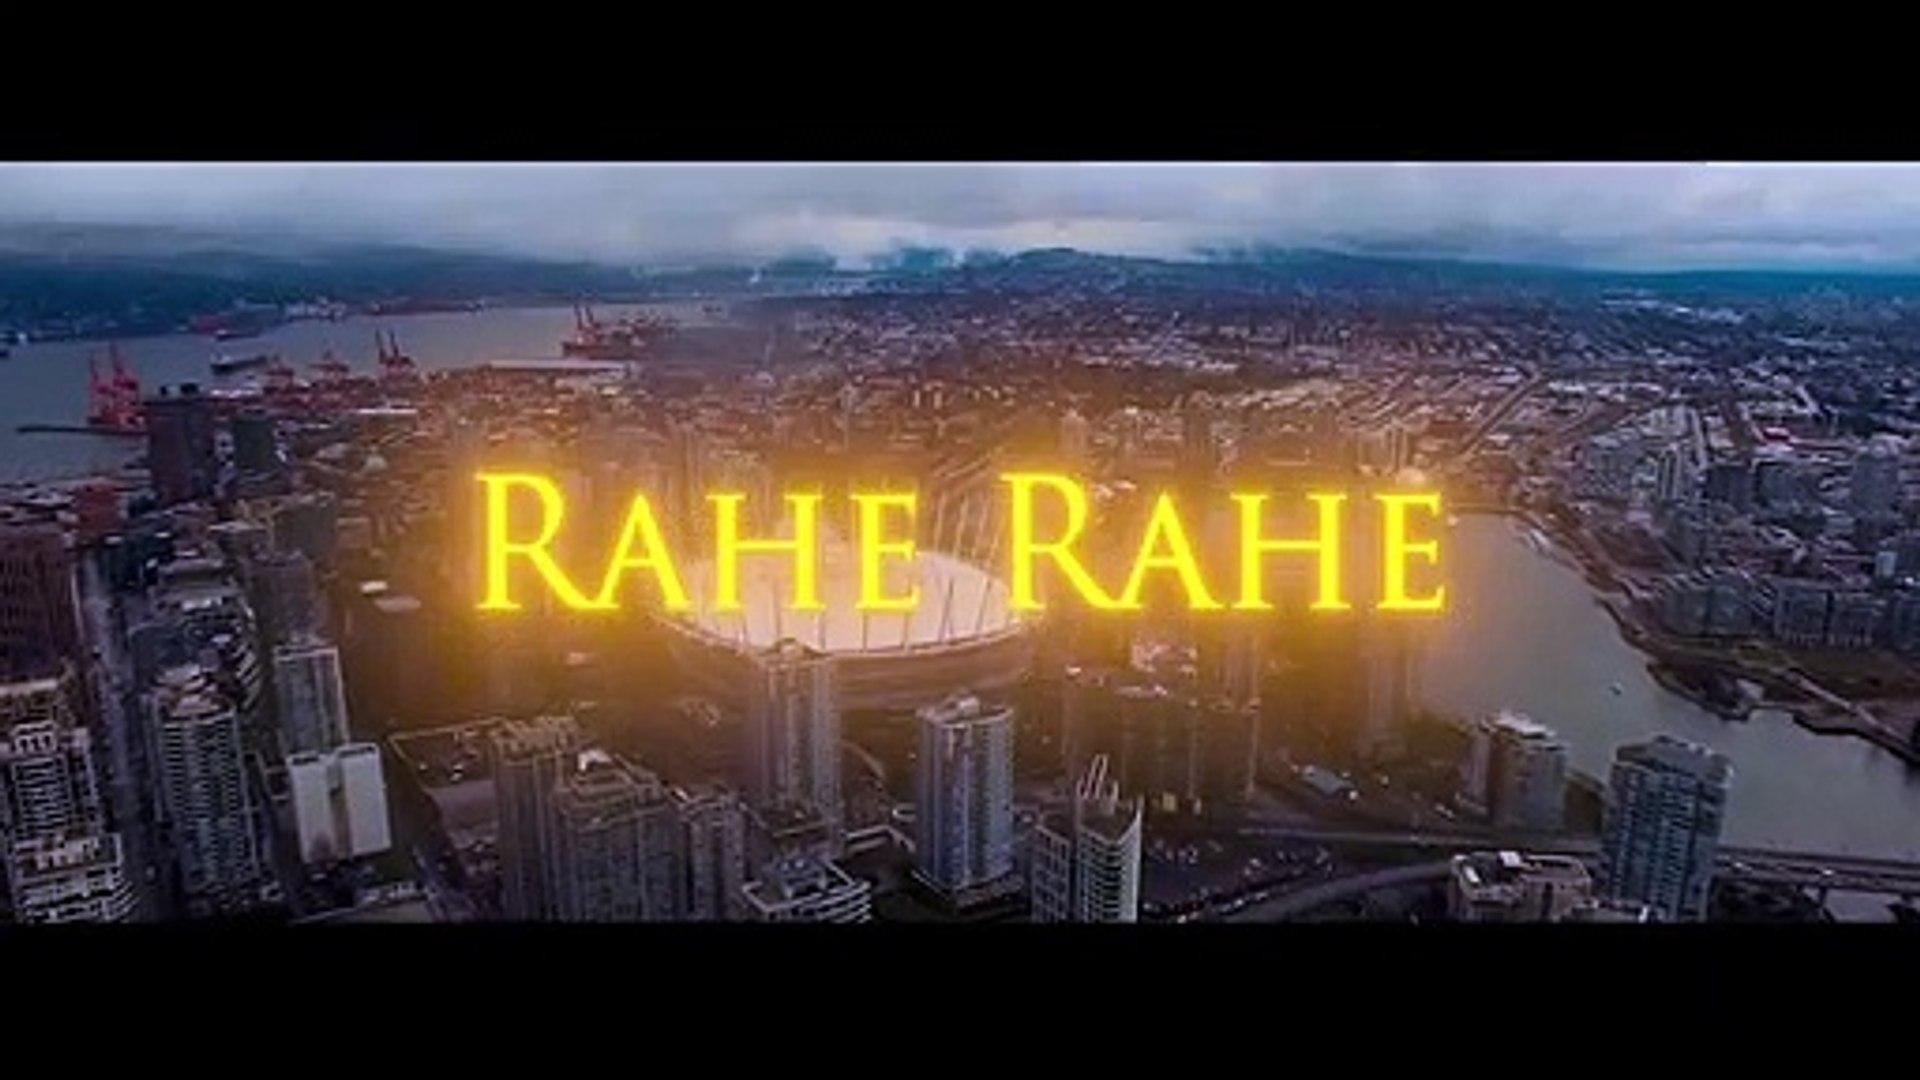 Rahe_Rahe_(Official_Teaser)_M_Chahal_|_New_Punjabi_Song_2021_|_Latest_Punjabi_Songs_2021_|_T-Series